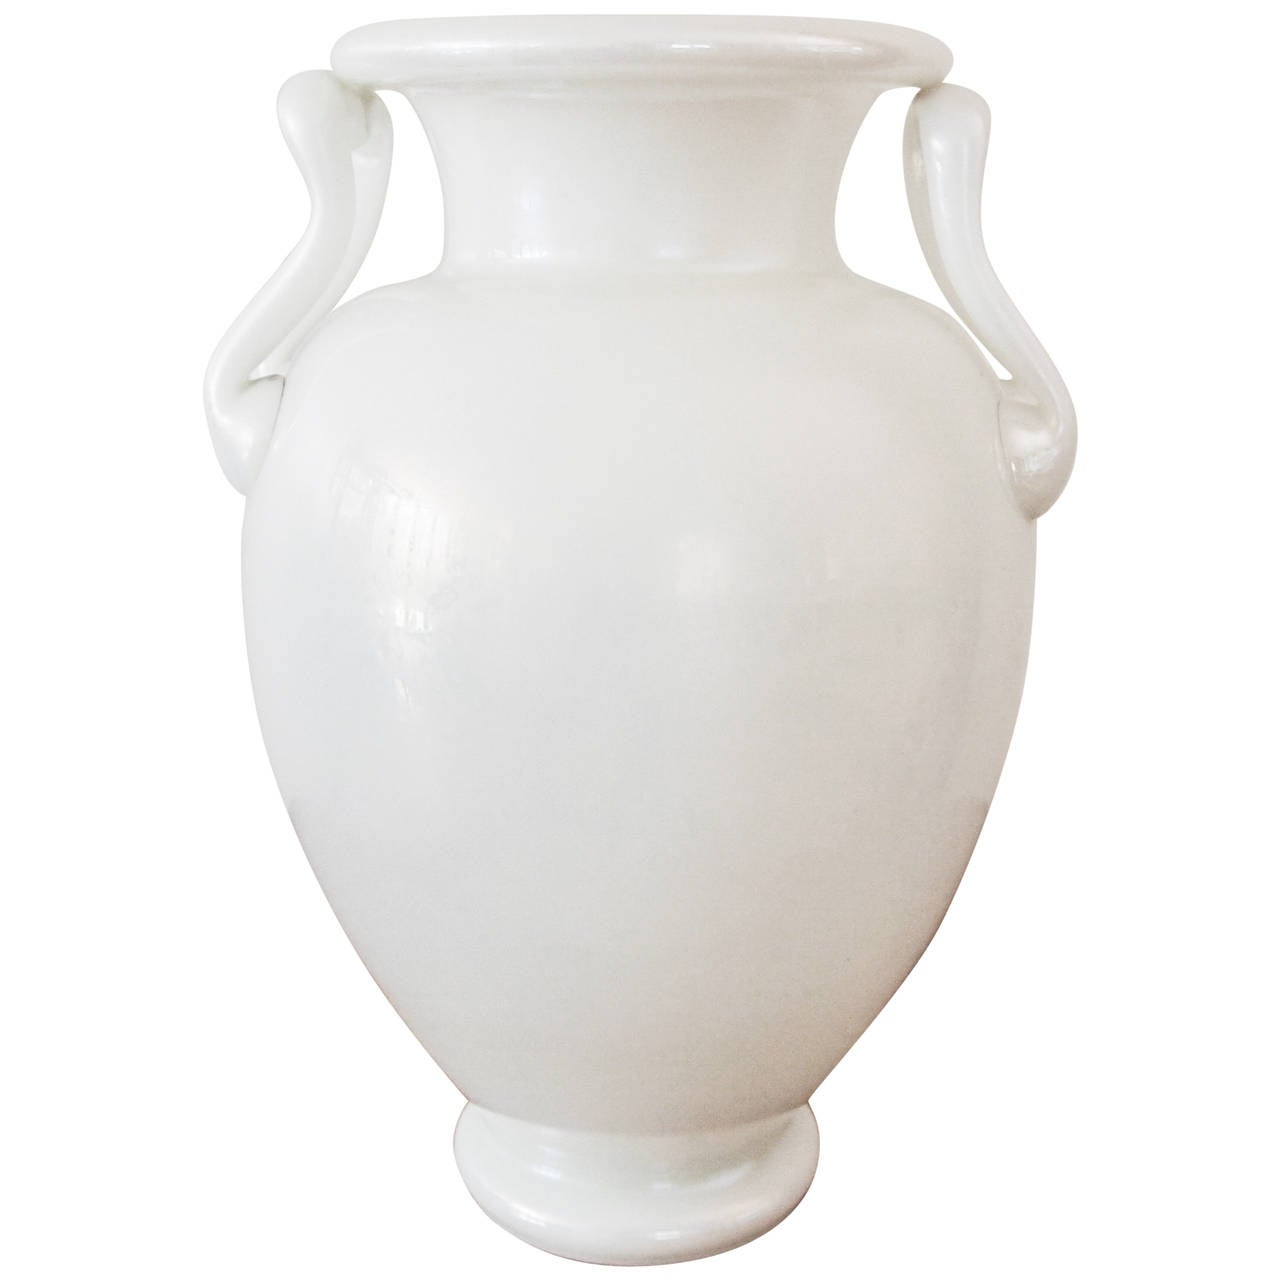 Ivrene Glass Vase by Frederick Carder for Steuben